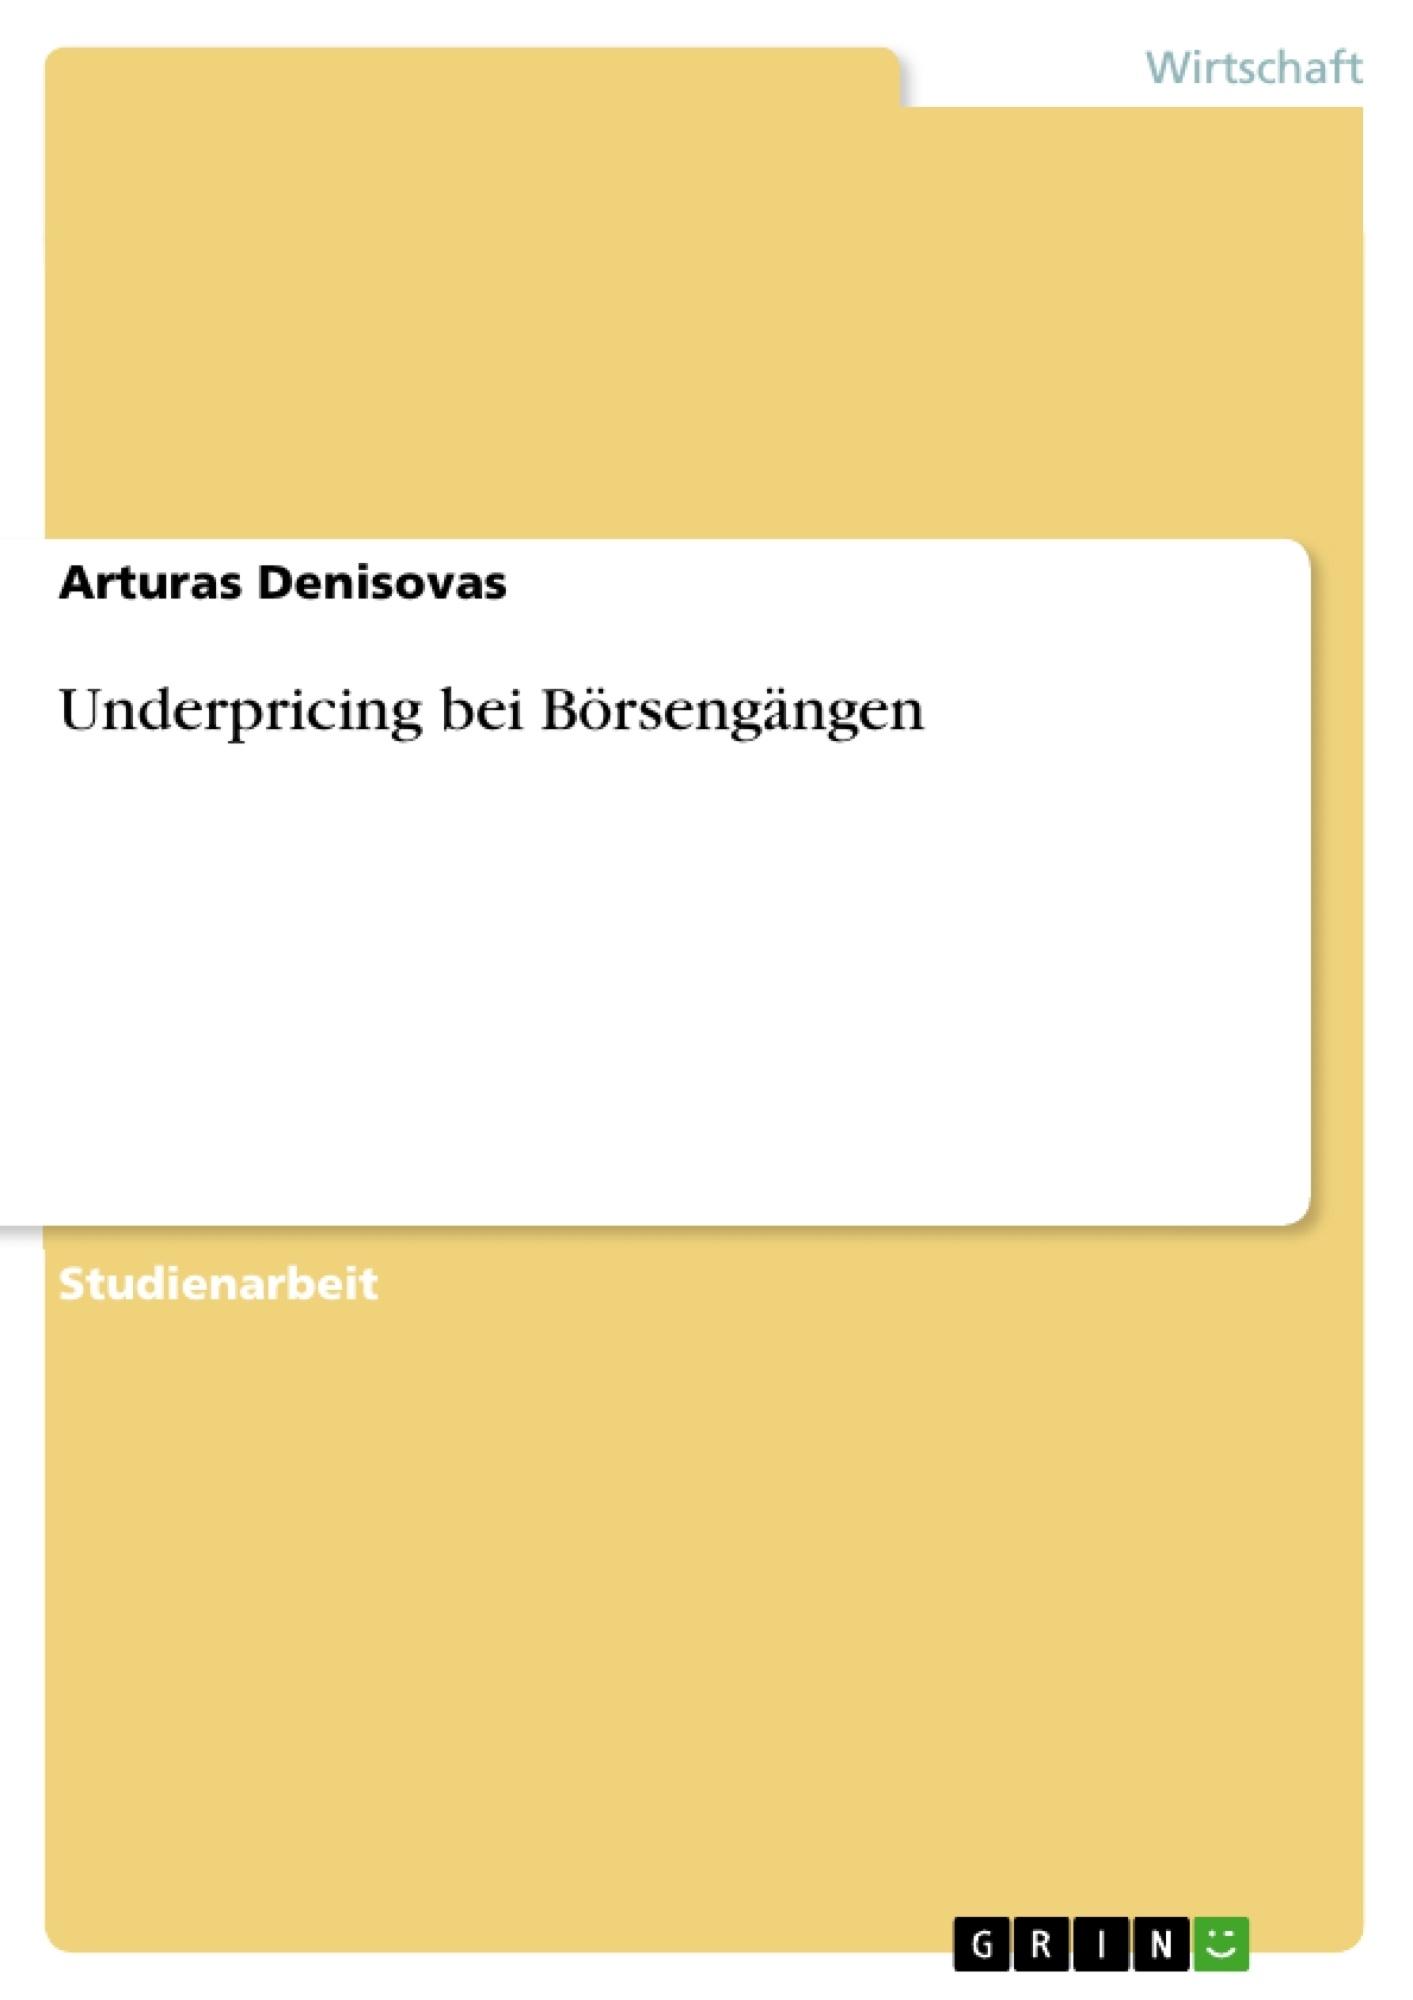 Titel: Underpricing bei Börsengängen